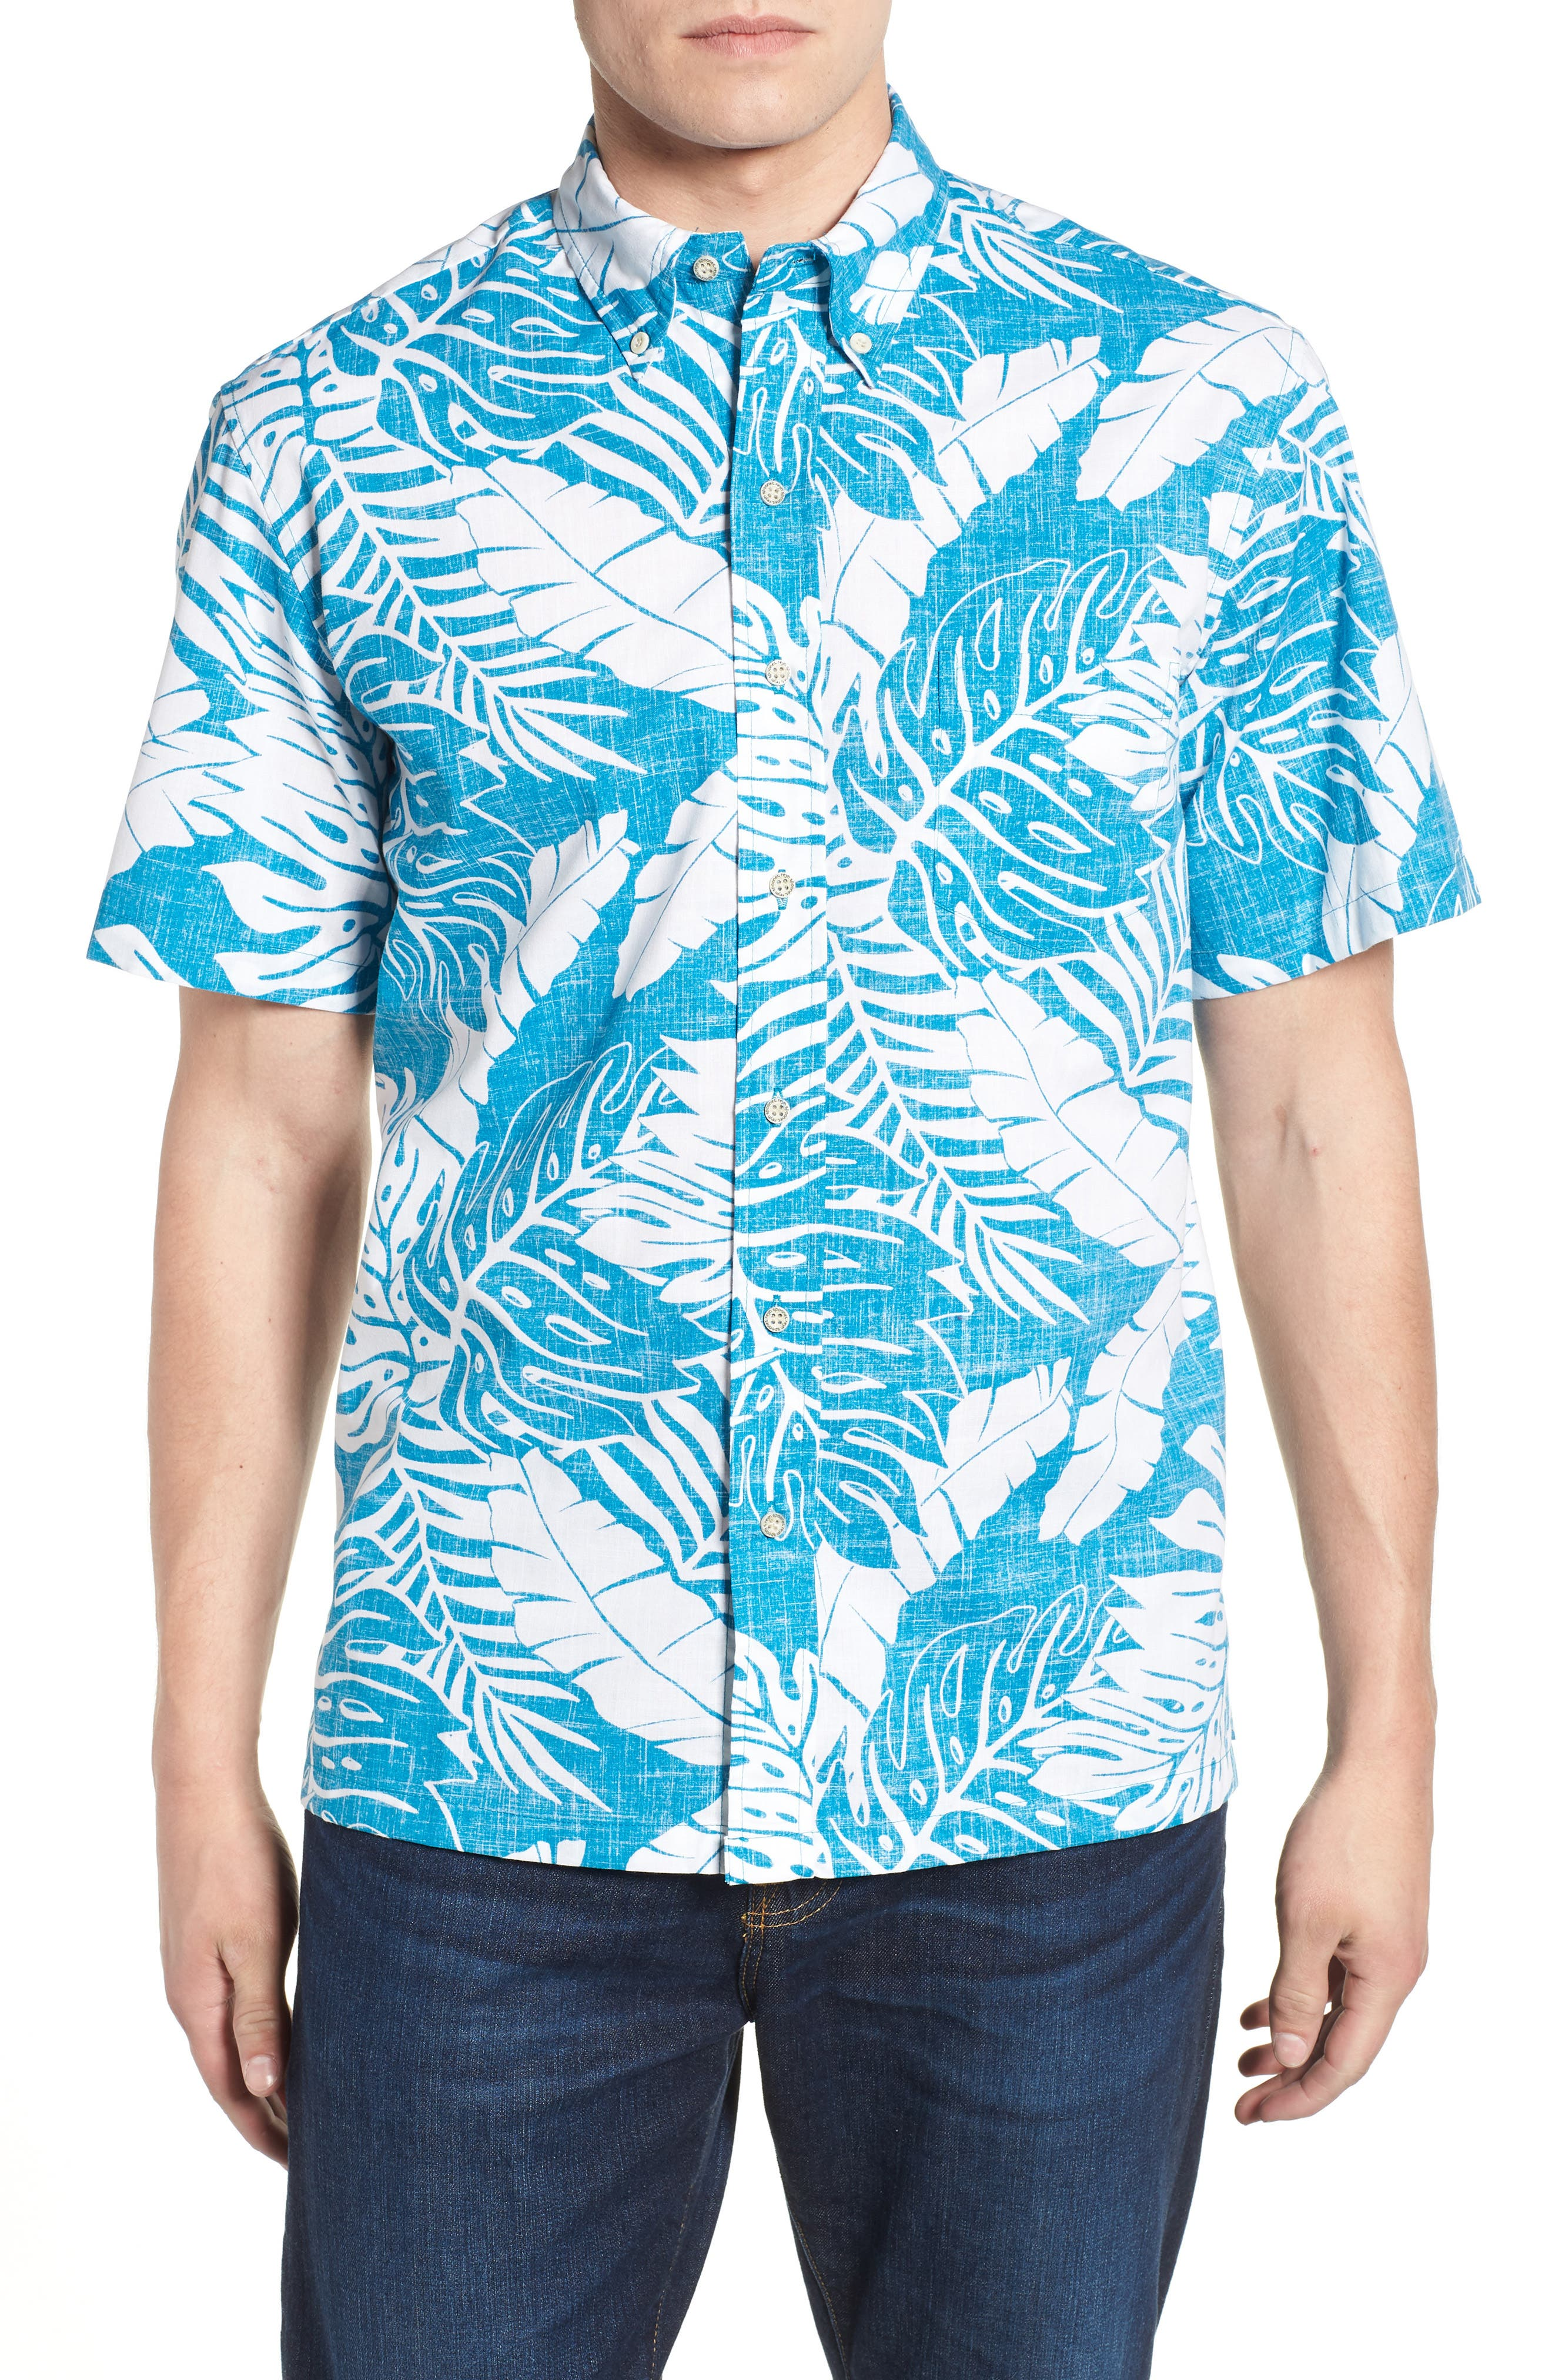 Avenue Falls Classic Fit Sport Shirt,                             Main thumbnail 1, color,                             Blue